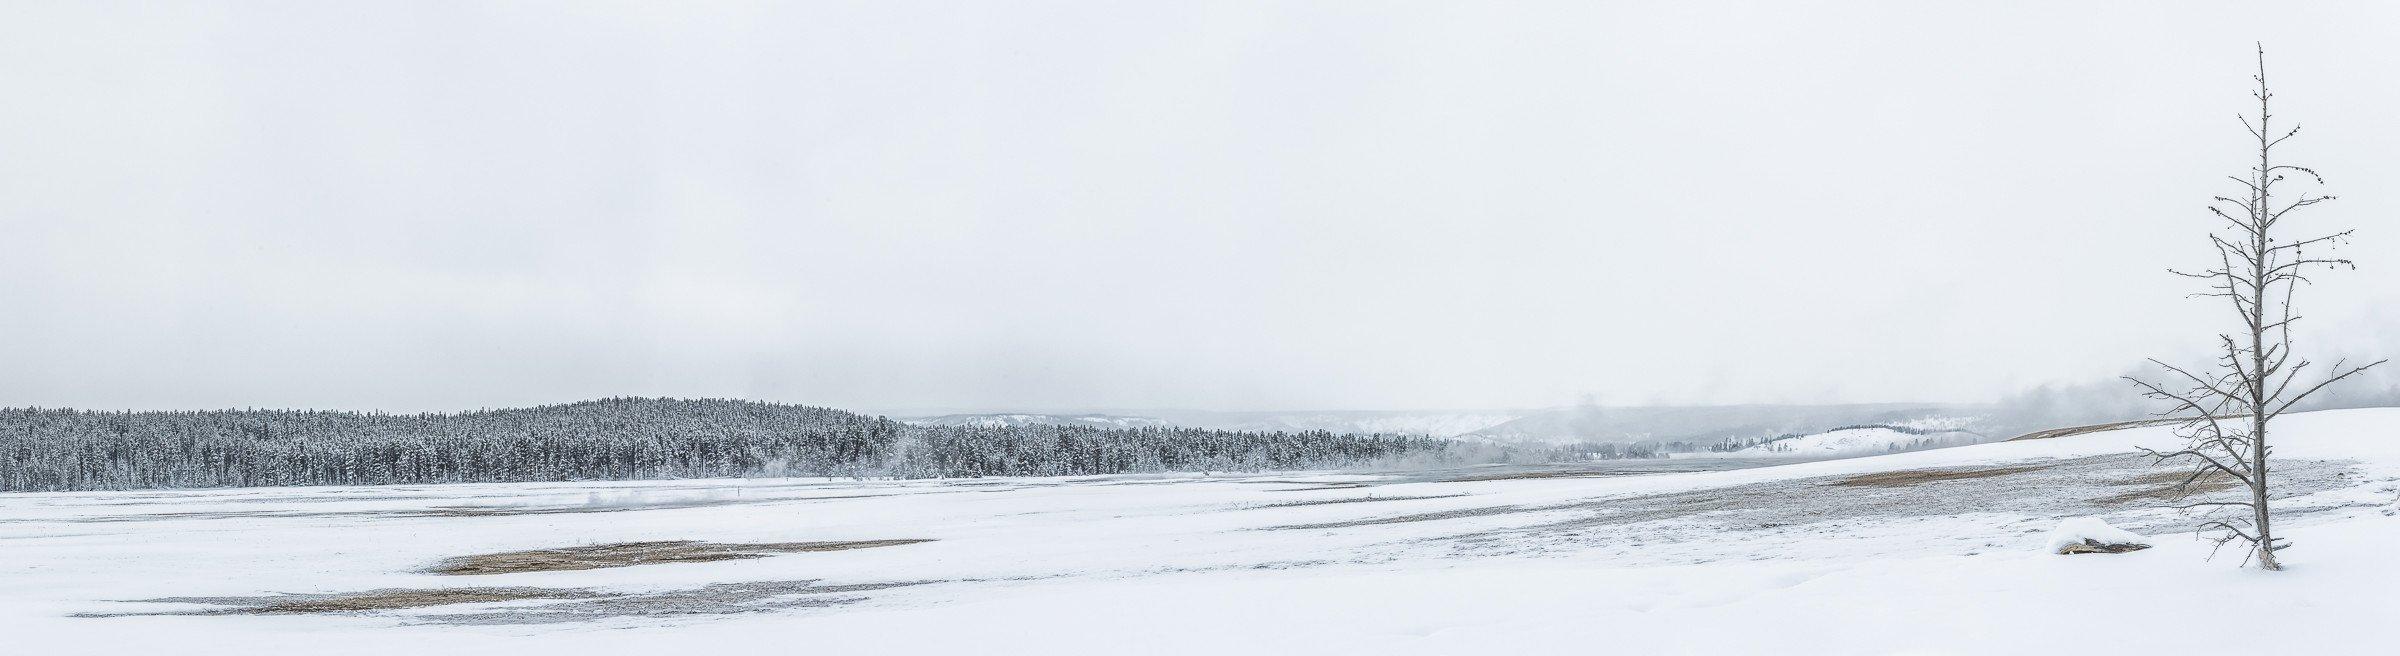 landschap Yellowstone 0194